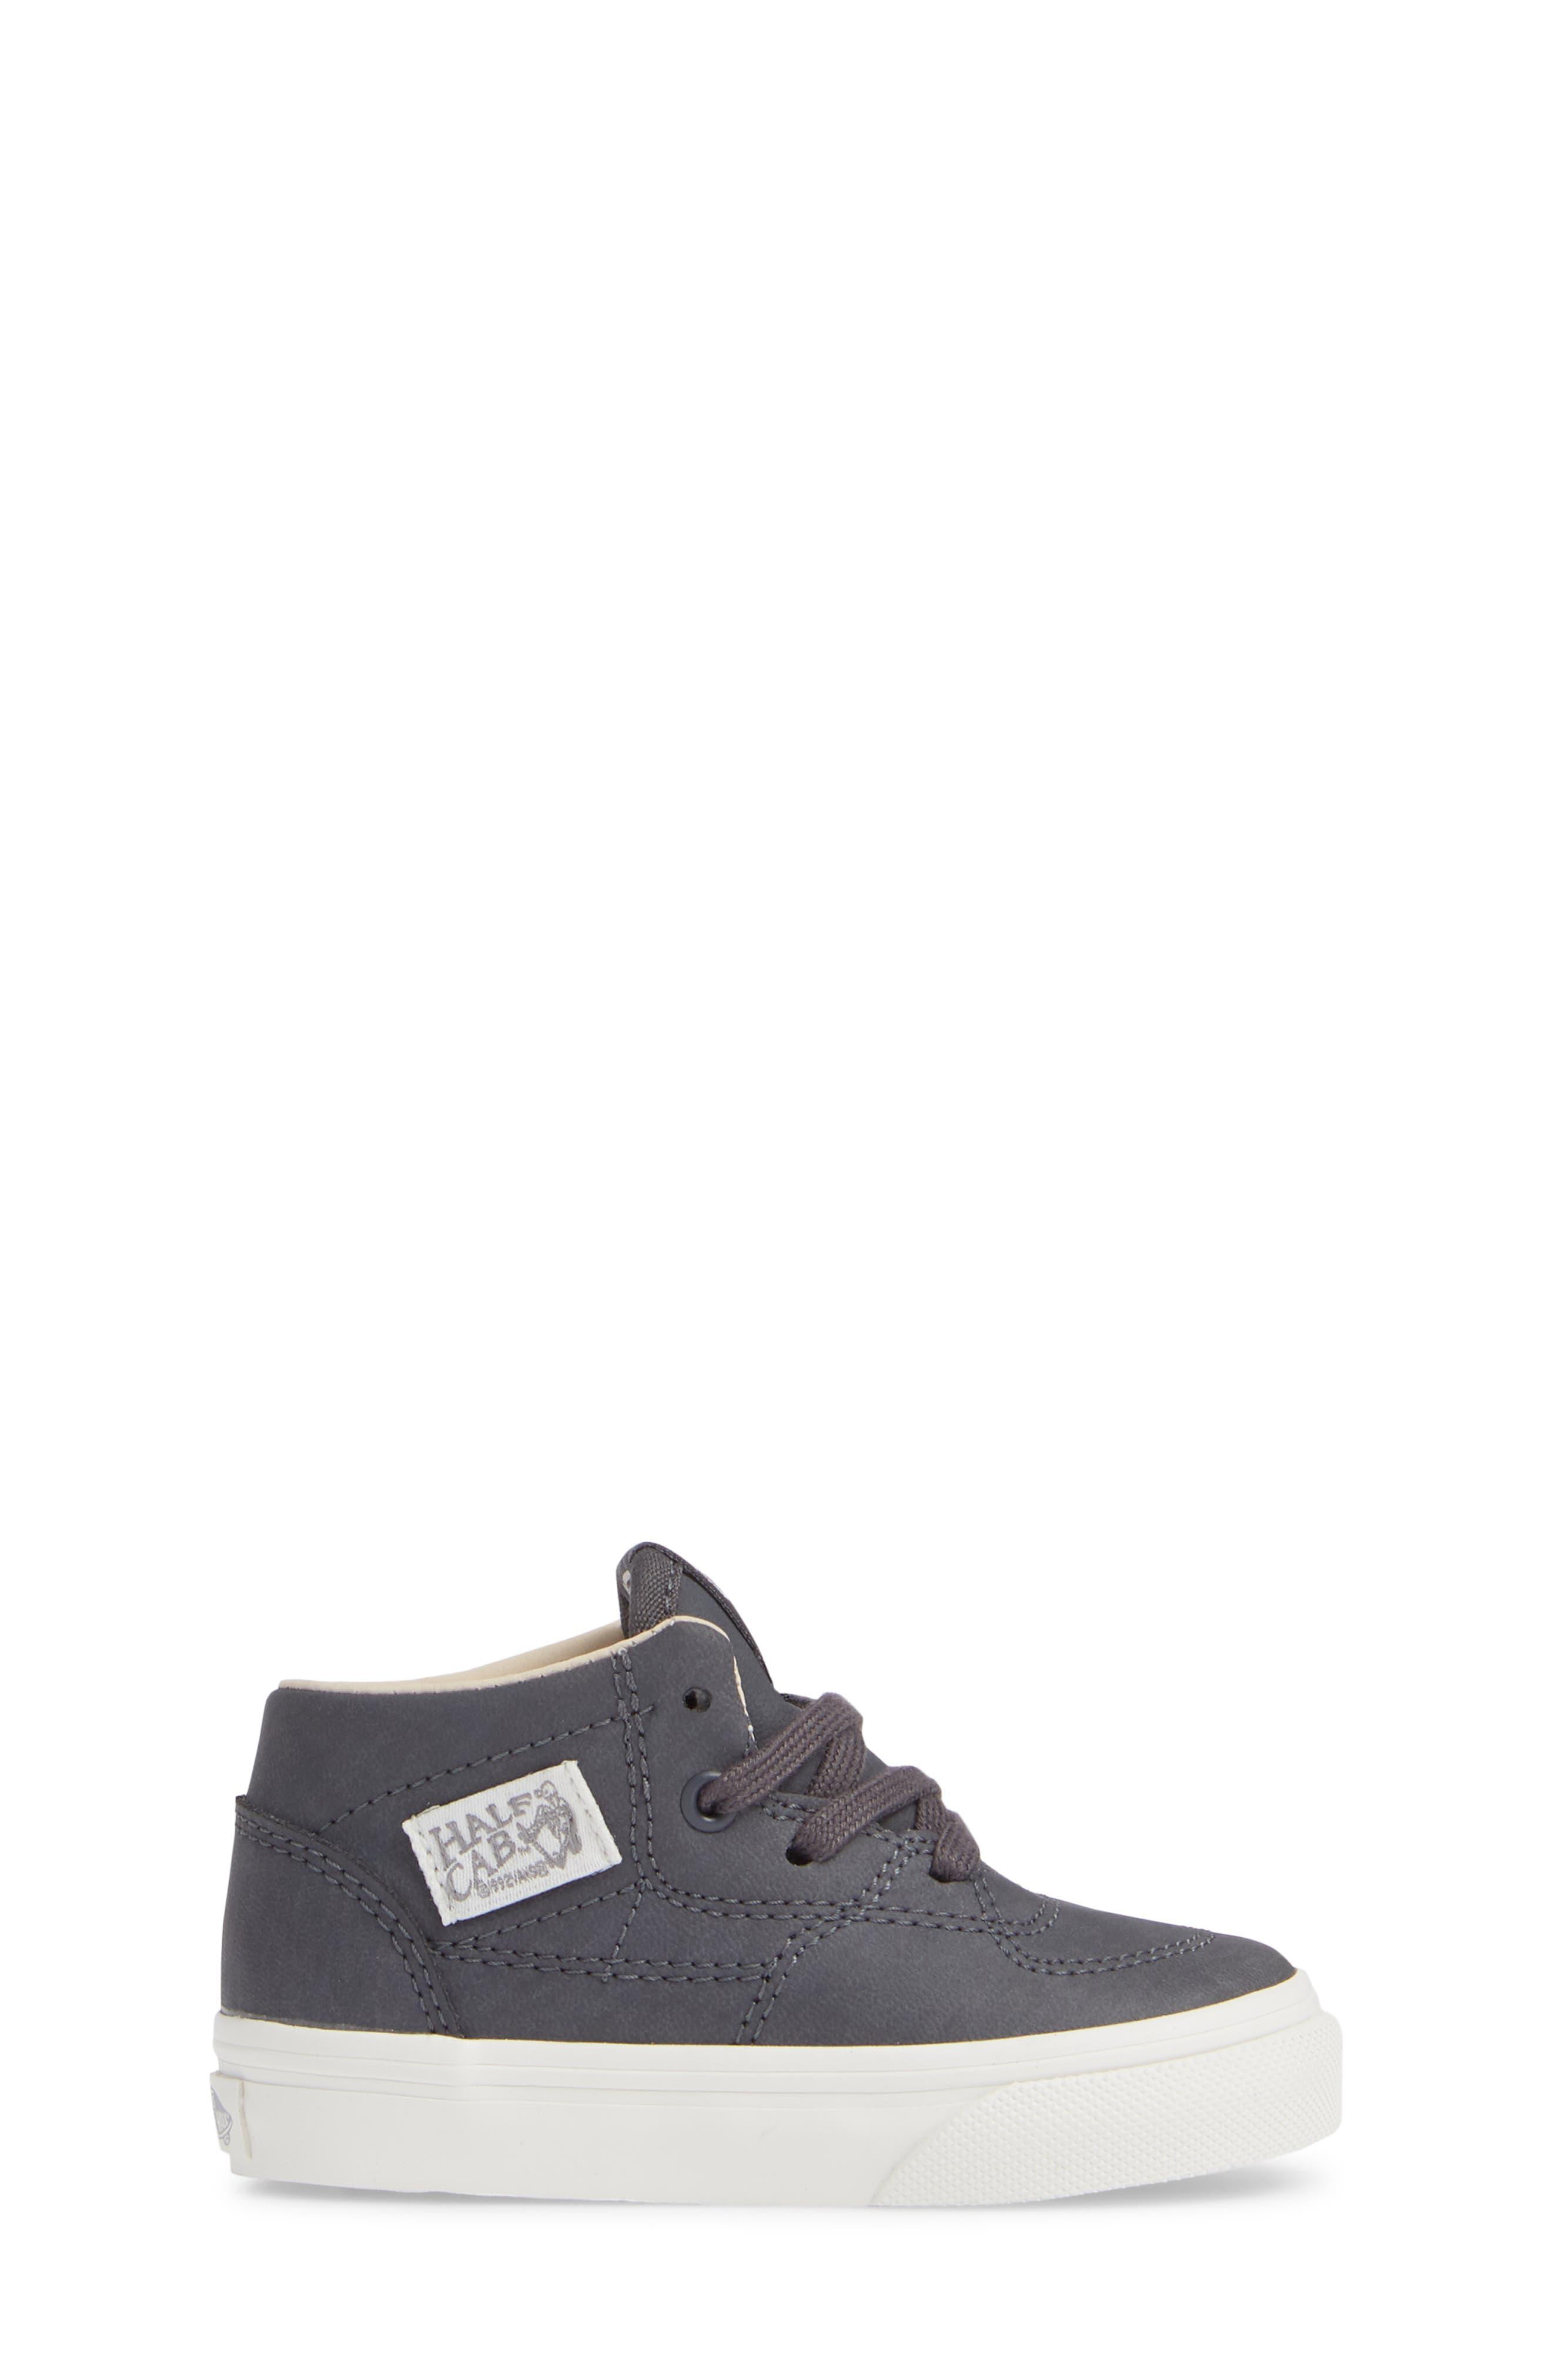 Half Cab Sneaker,                             Alternate thumbnail 3, color,                             VANSBUCK ASPHALT/ BLANC